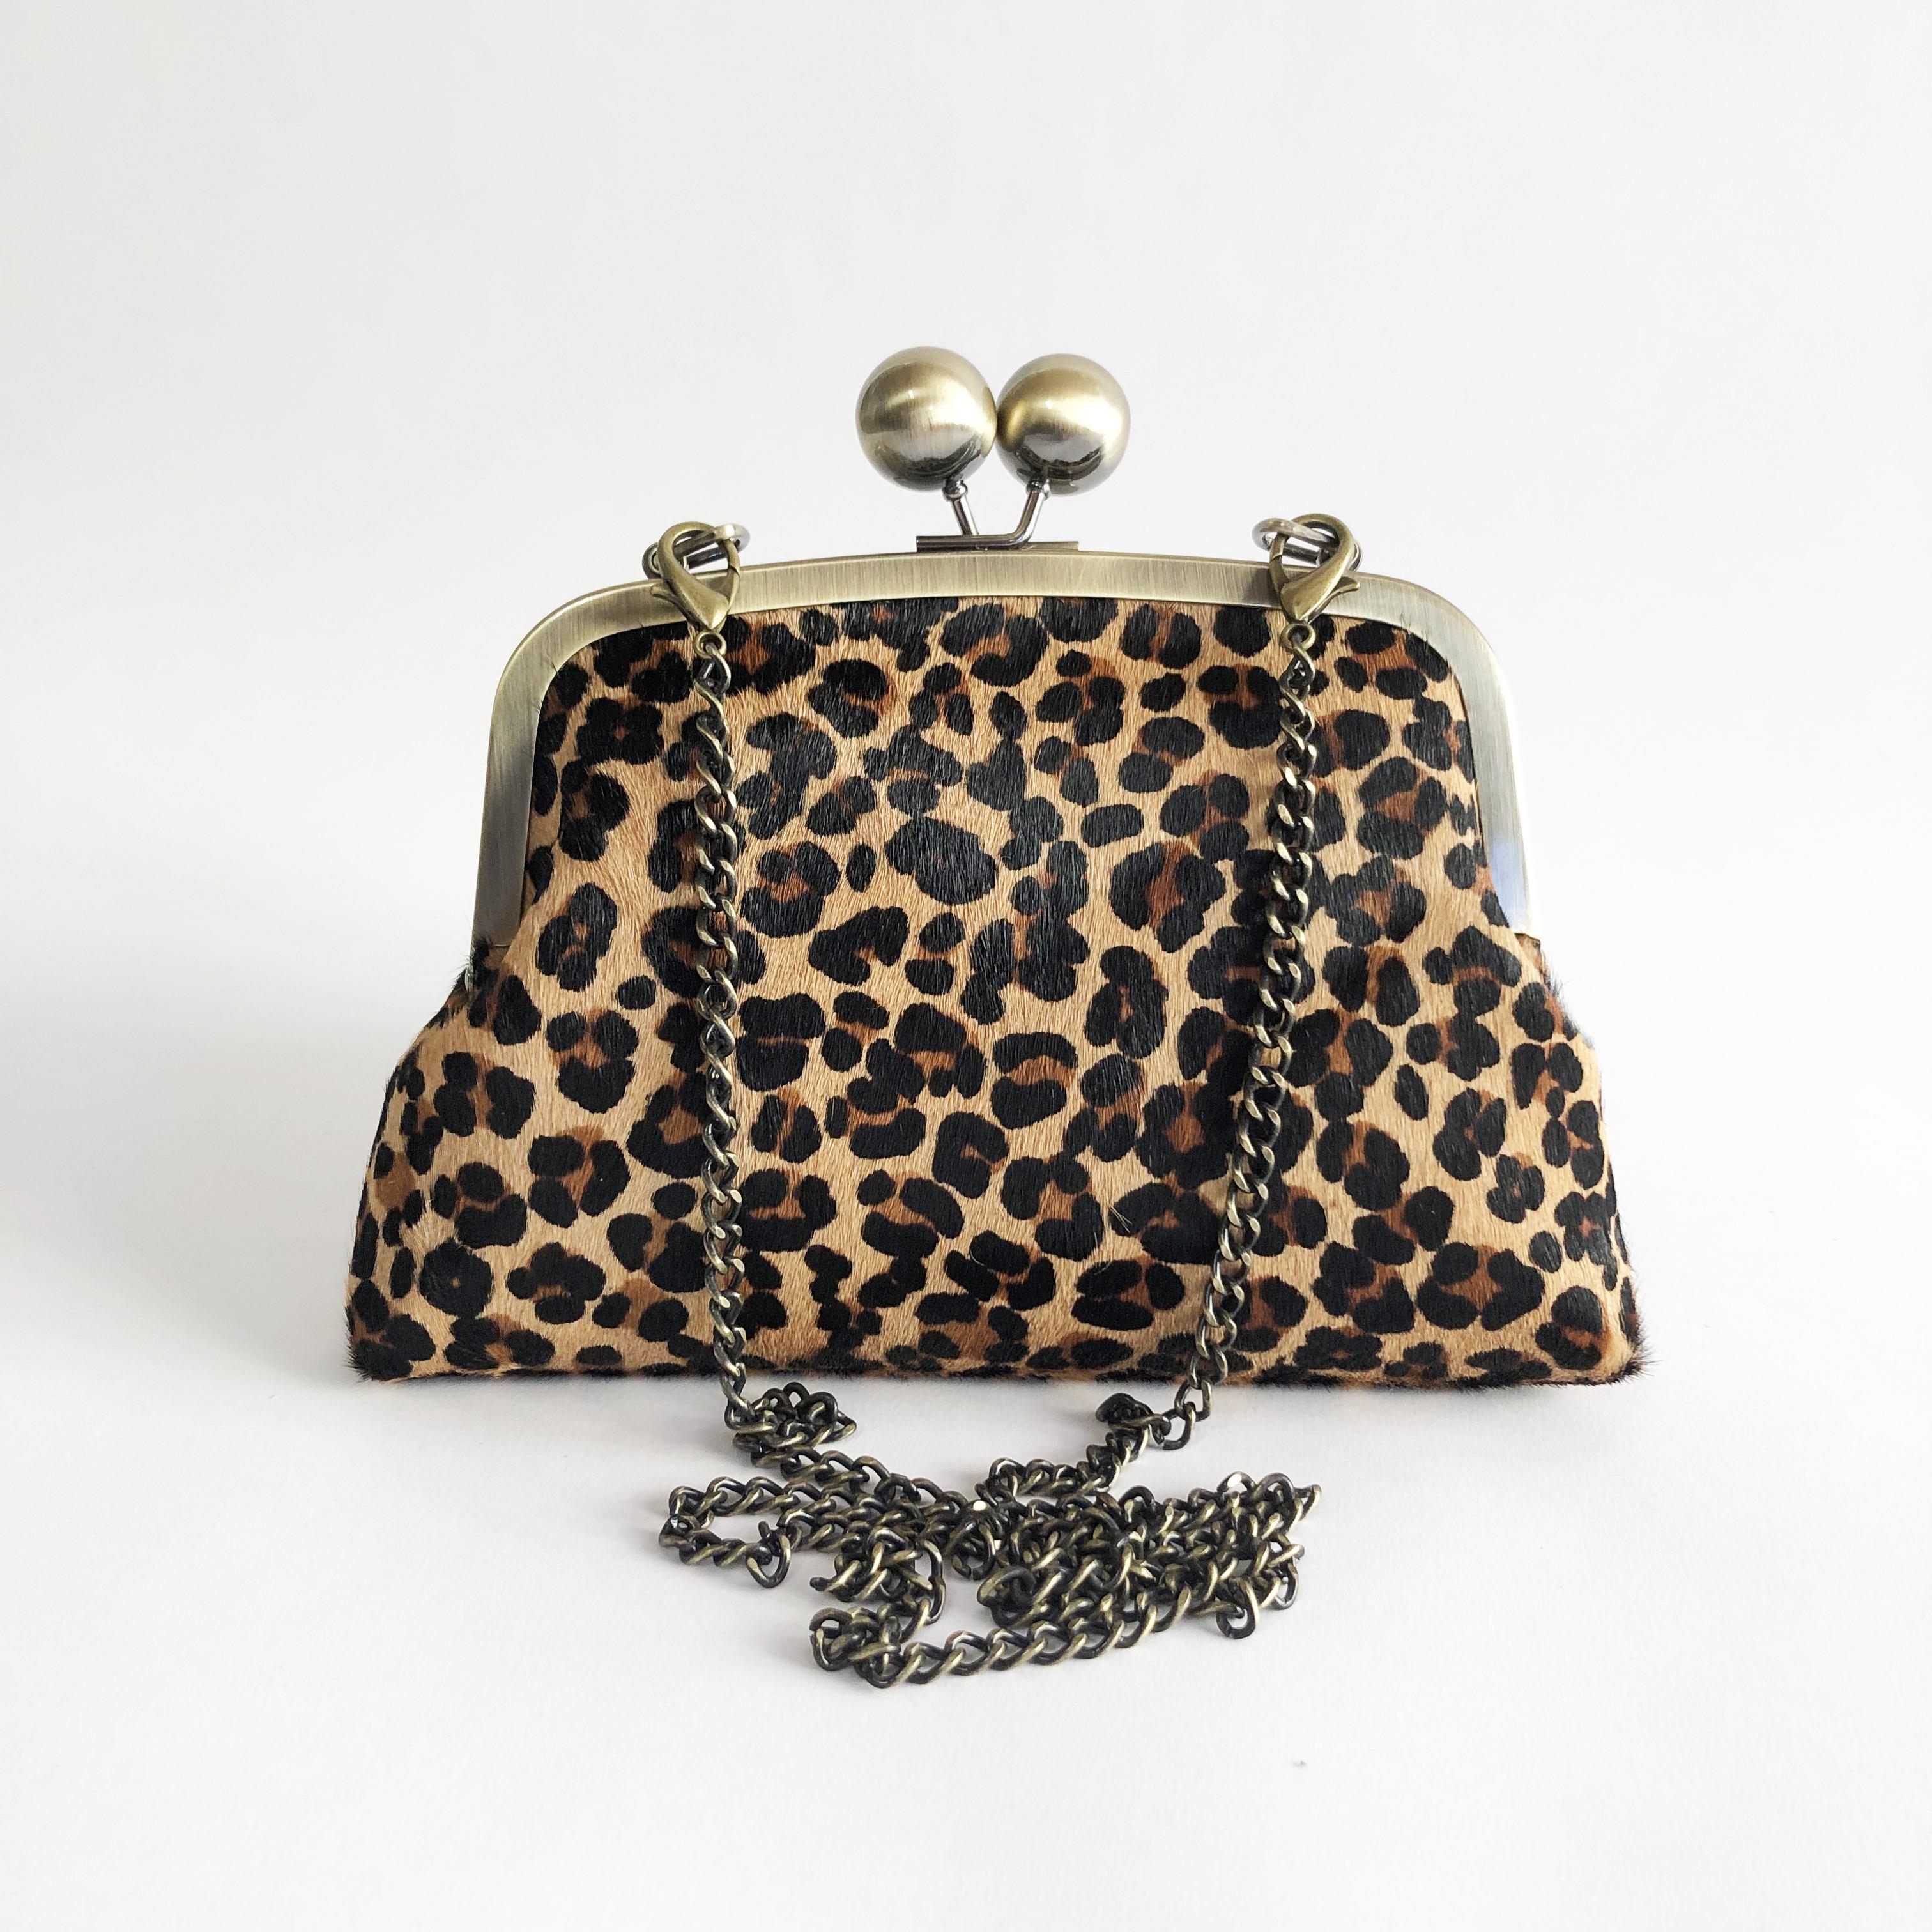 436fe7a467 Leopard print handbag / animal print clutch purse with strap